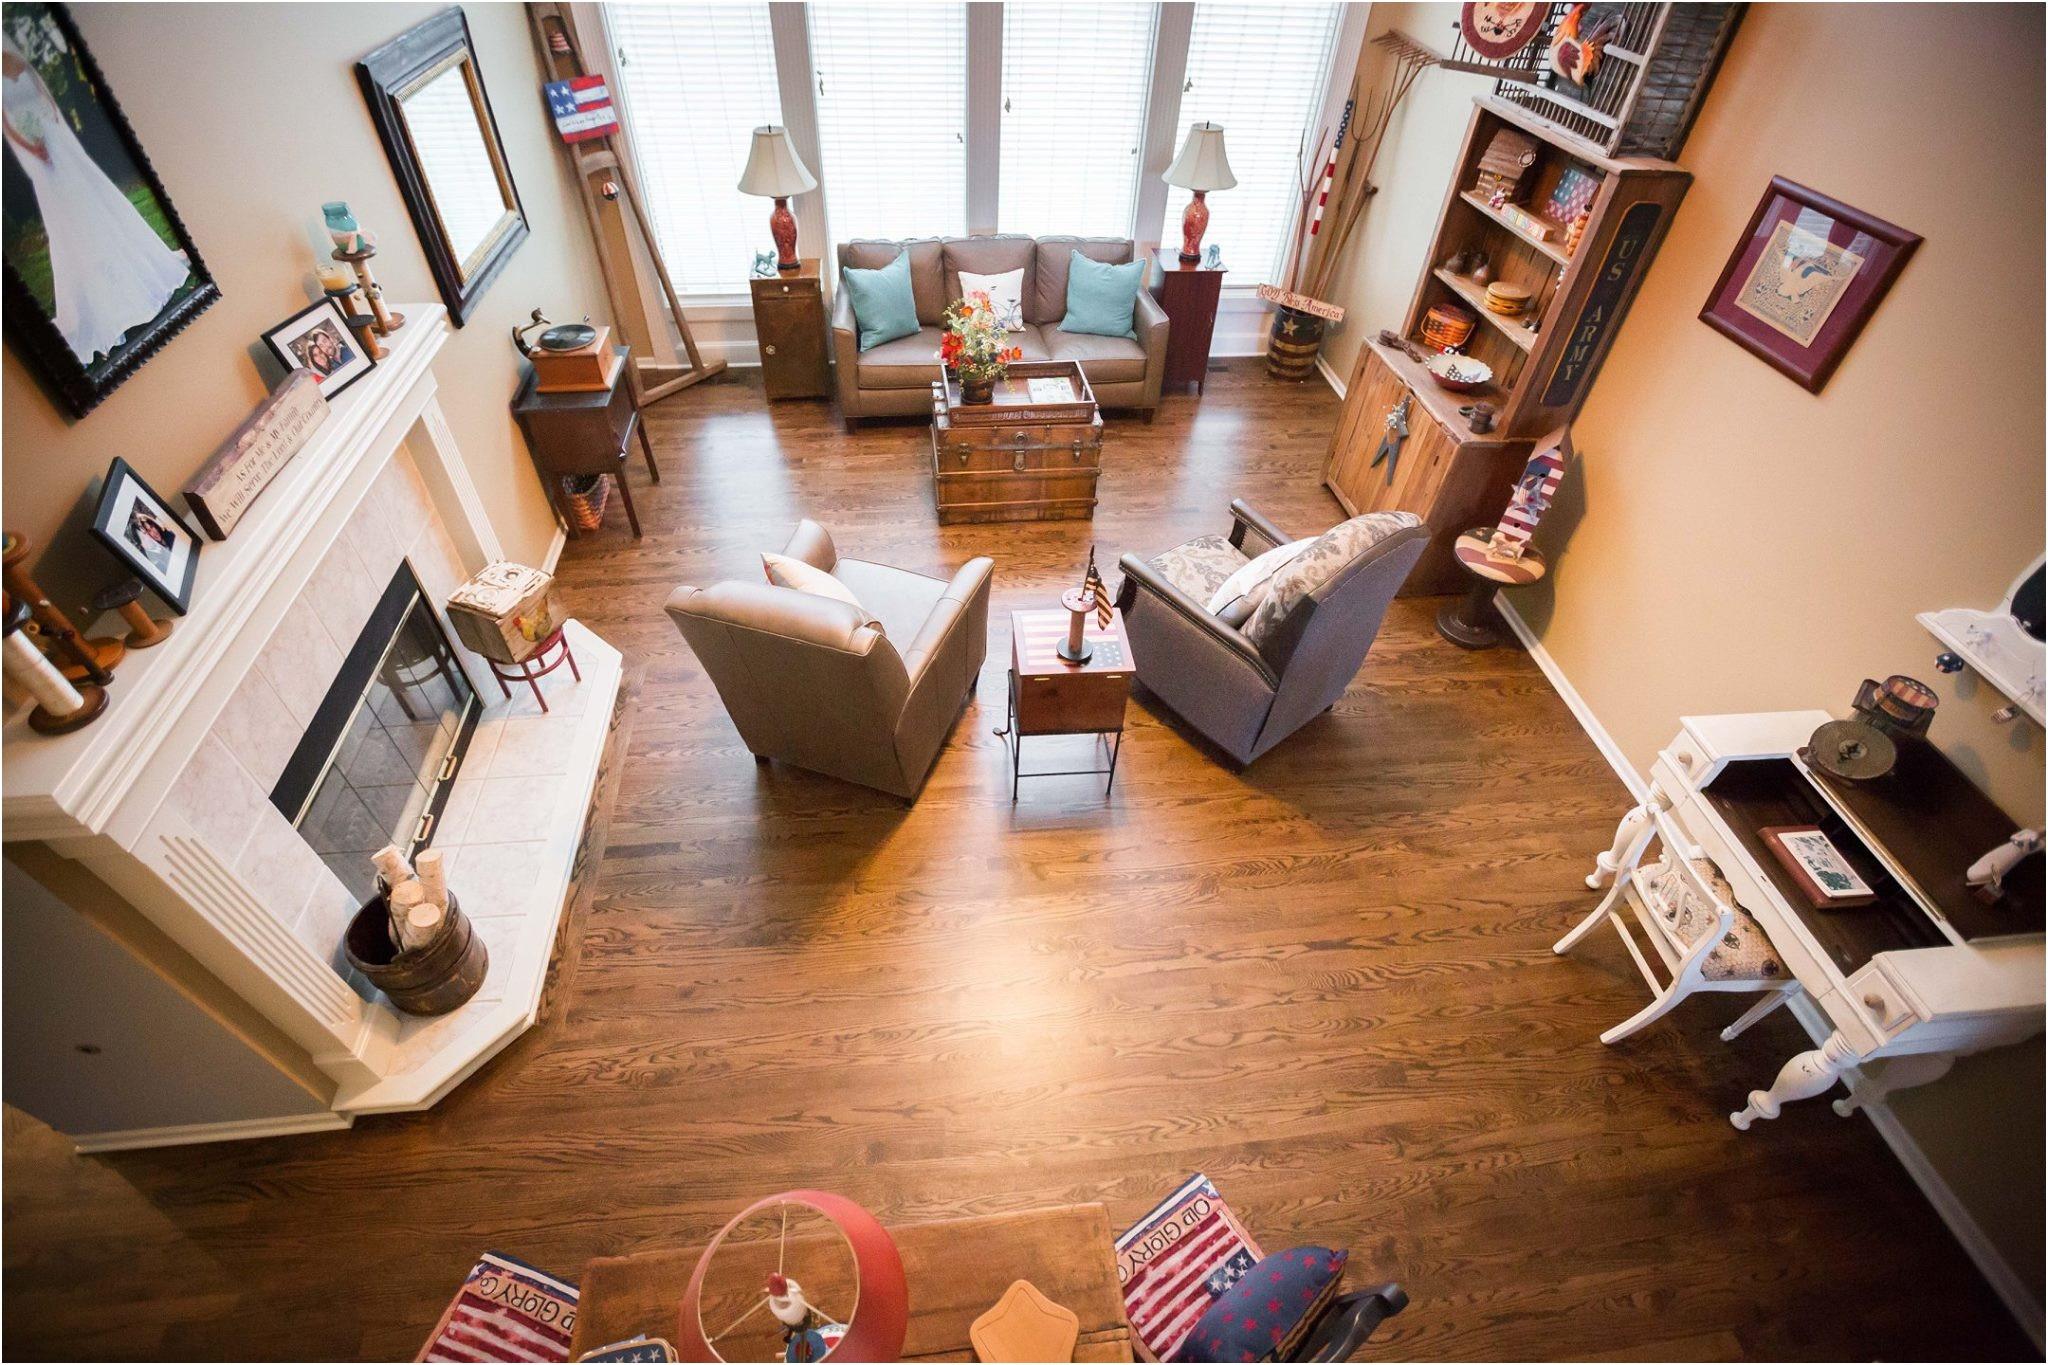 restaining hardwood floors of how to choose laminate flooring luxury articles rippnfinish inside how to choose laminate flooring luxury articles rippnfinish hardwood floor refinishing